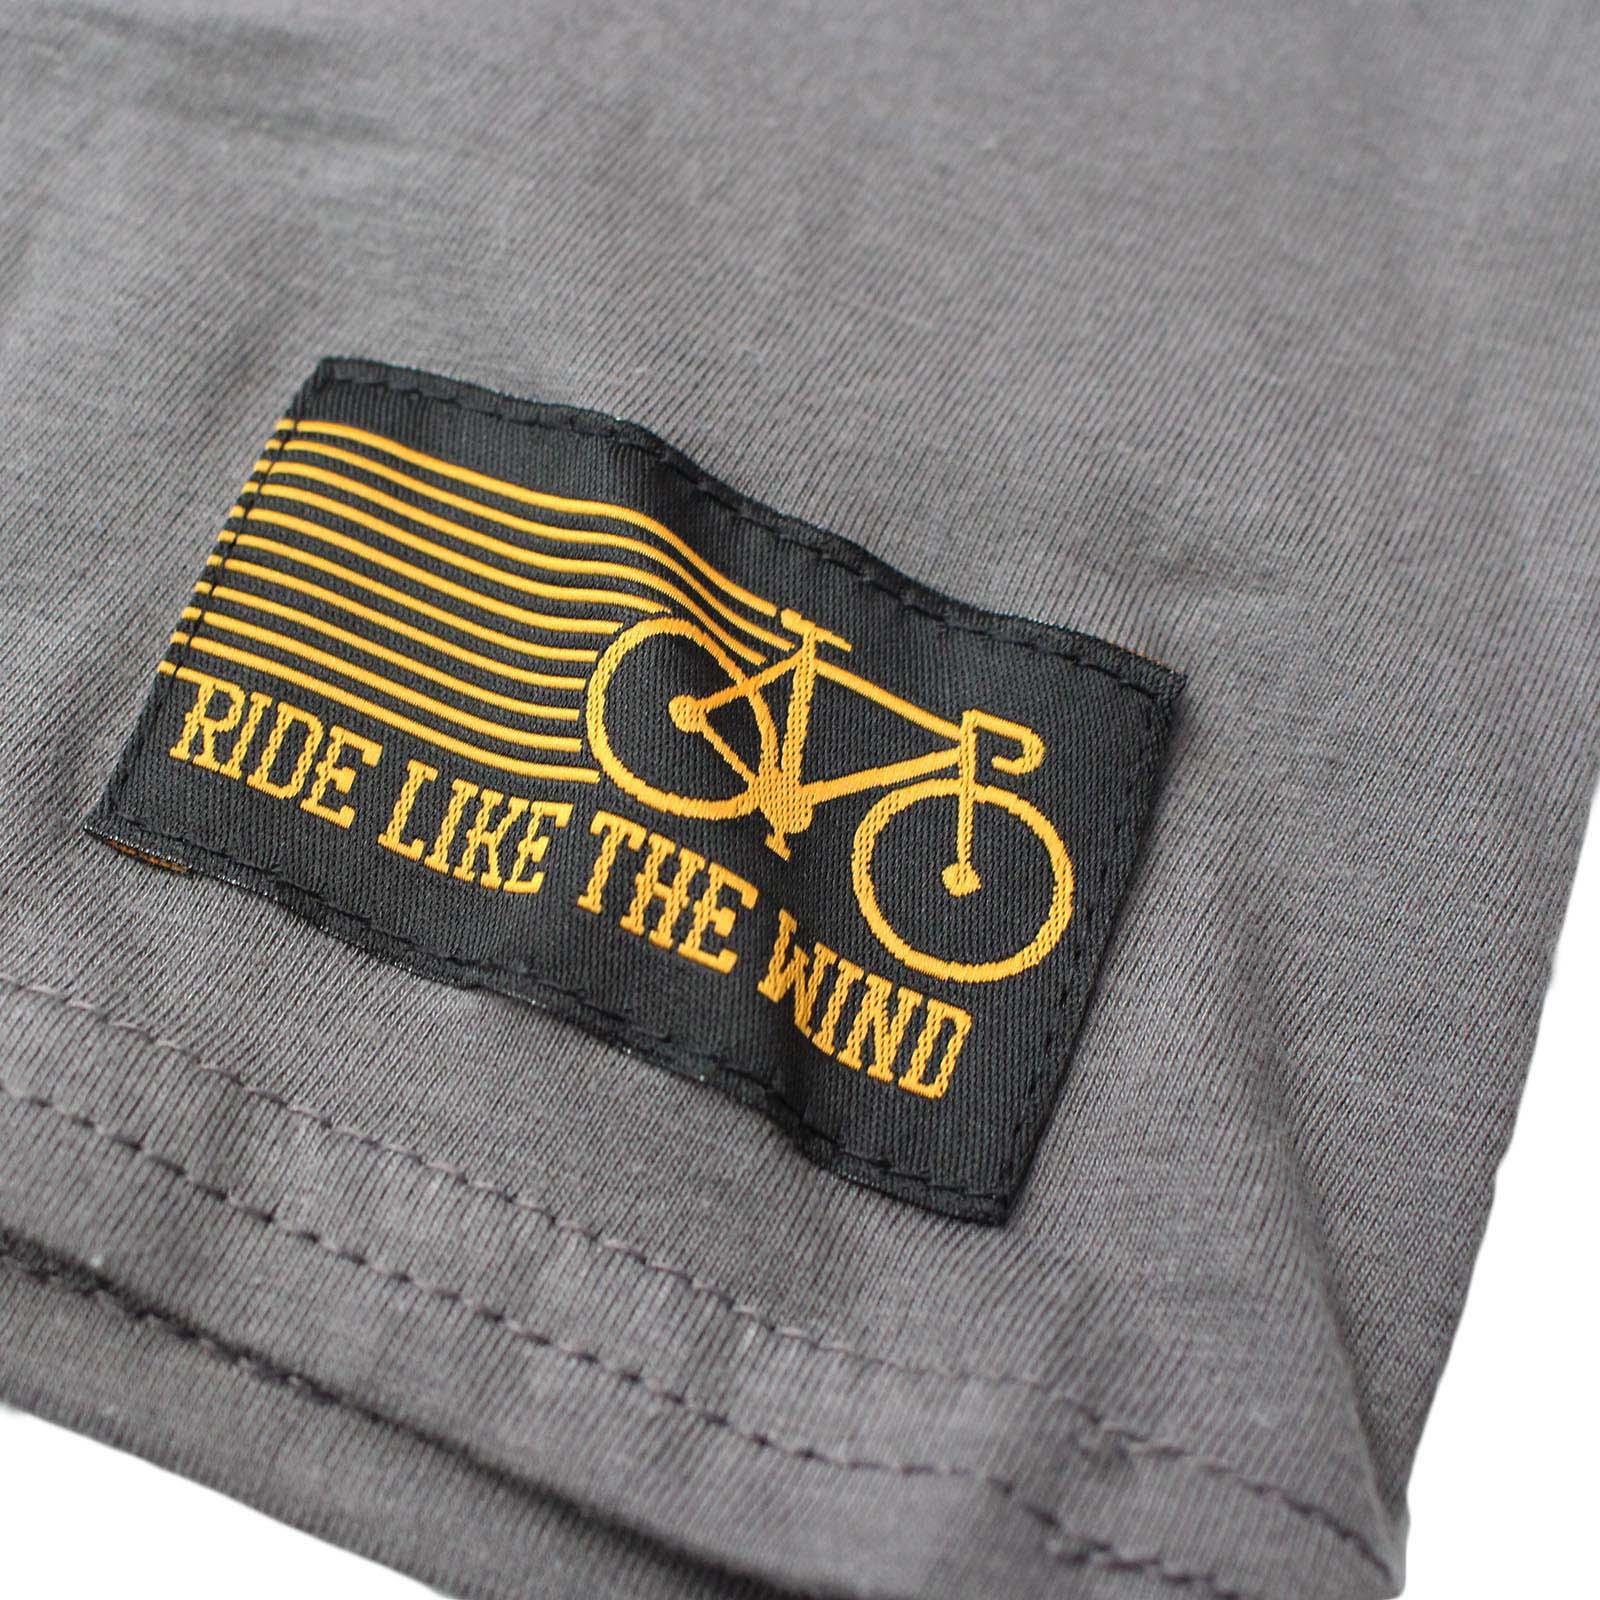 Cycling-Yeah-My-Bike-Did-Cost-More-funny-top-Birthday-tee-T-SHIRT-T-SHIRT thumbnail 9